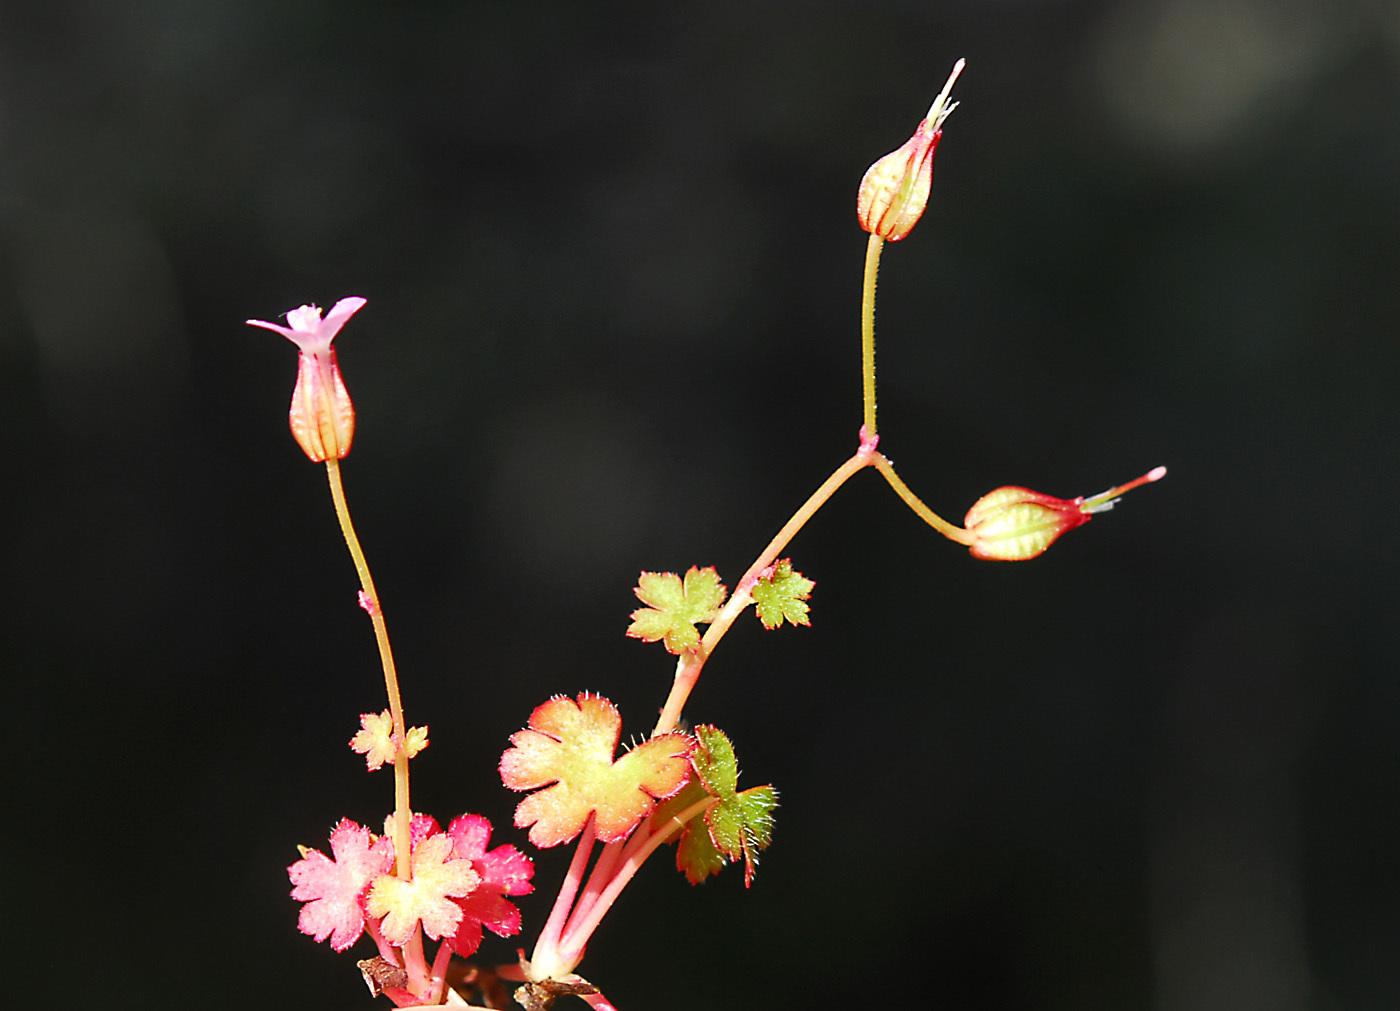 https://pictures.bgbm.org/digilib/Scaler?fn=Cyprus/Geranium_lucidum_B1.jpg&mo=file